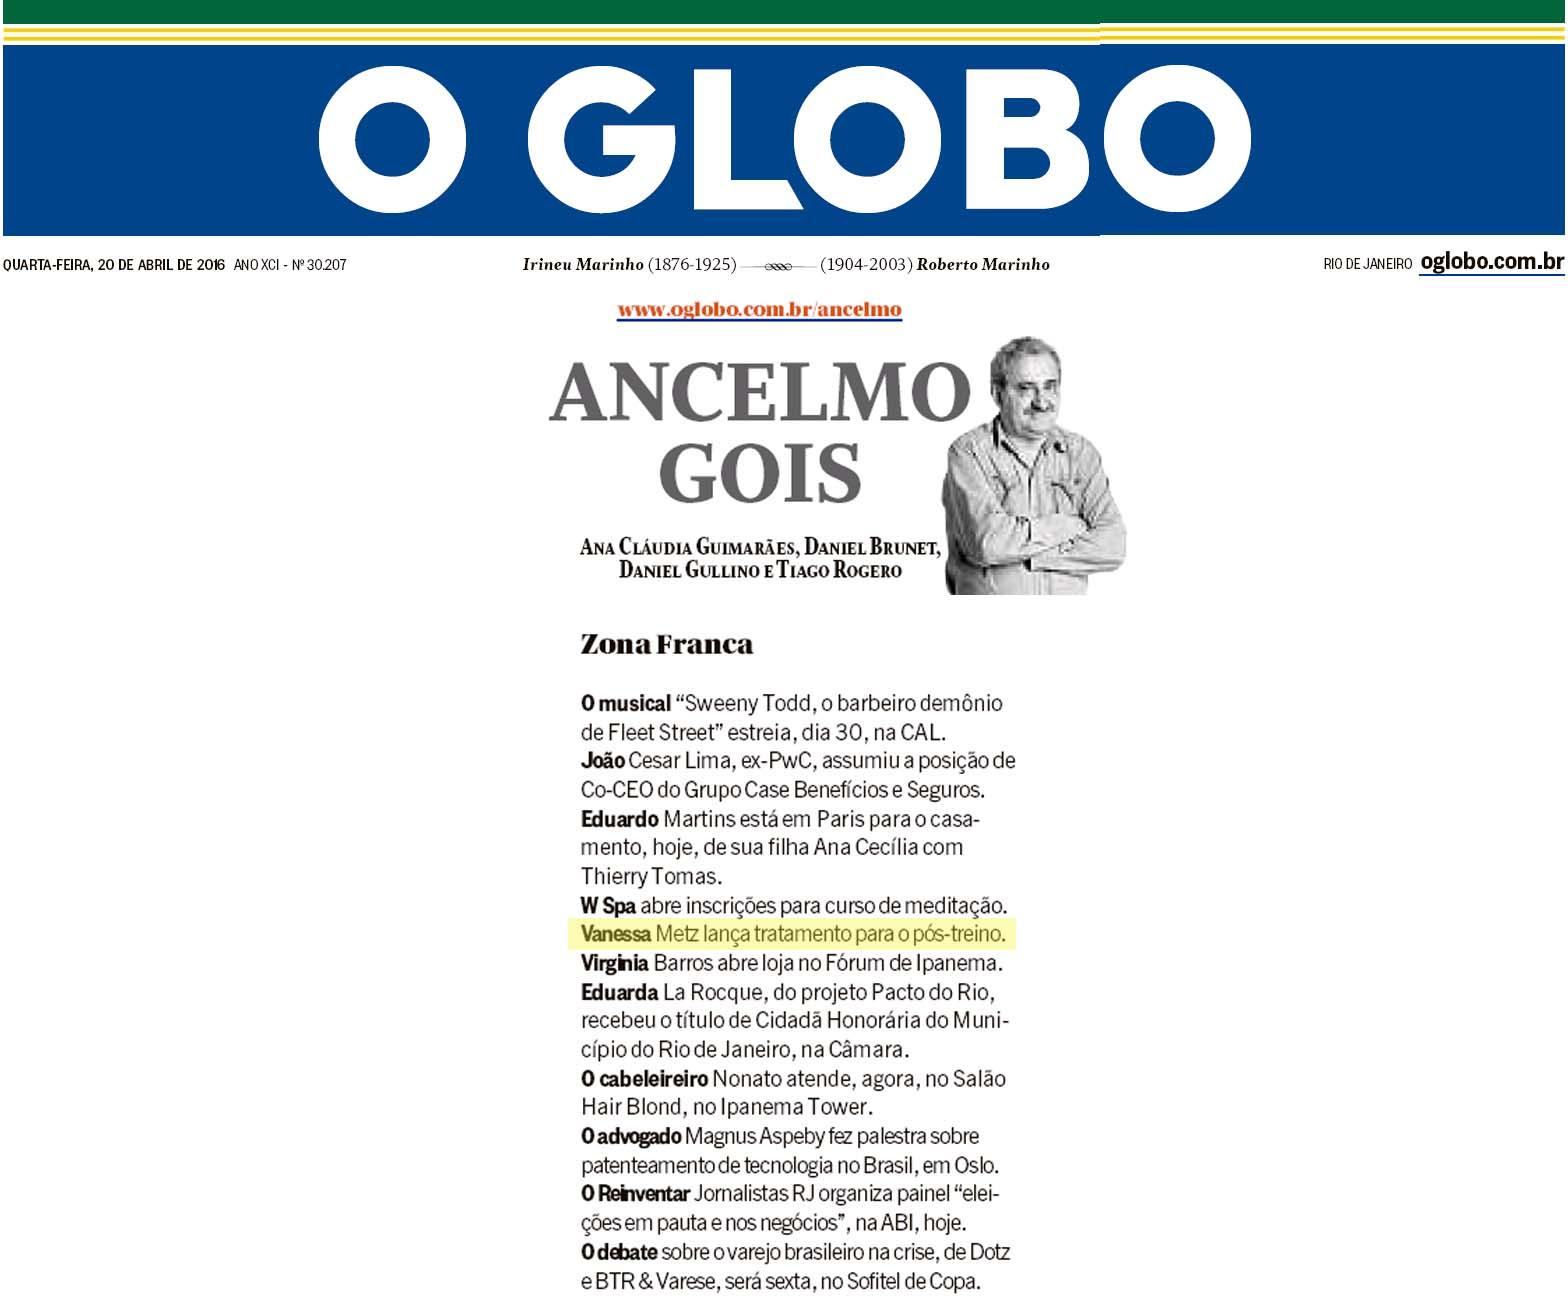 O Globo - Ancelmo Gois - 20.04.16